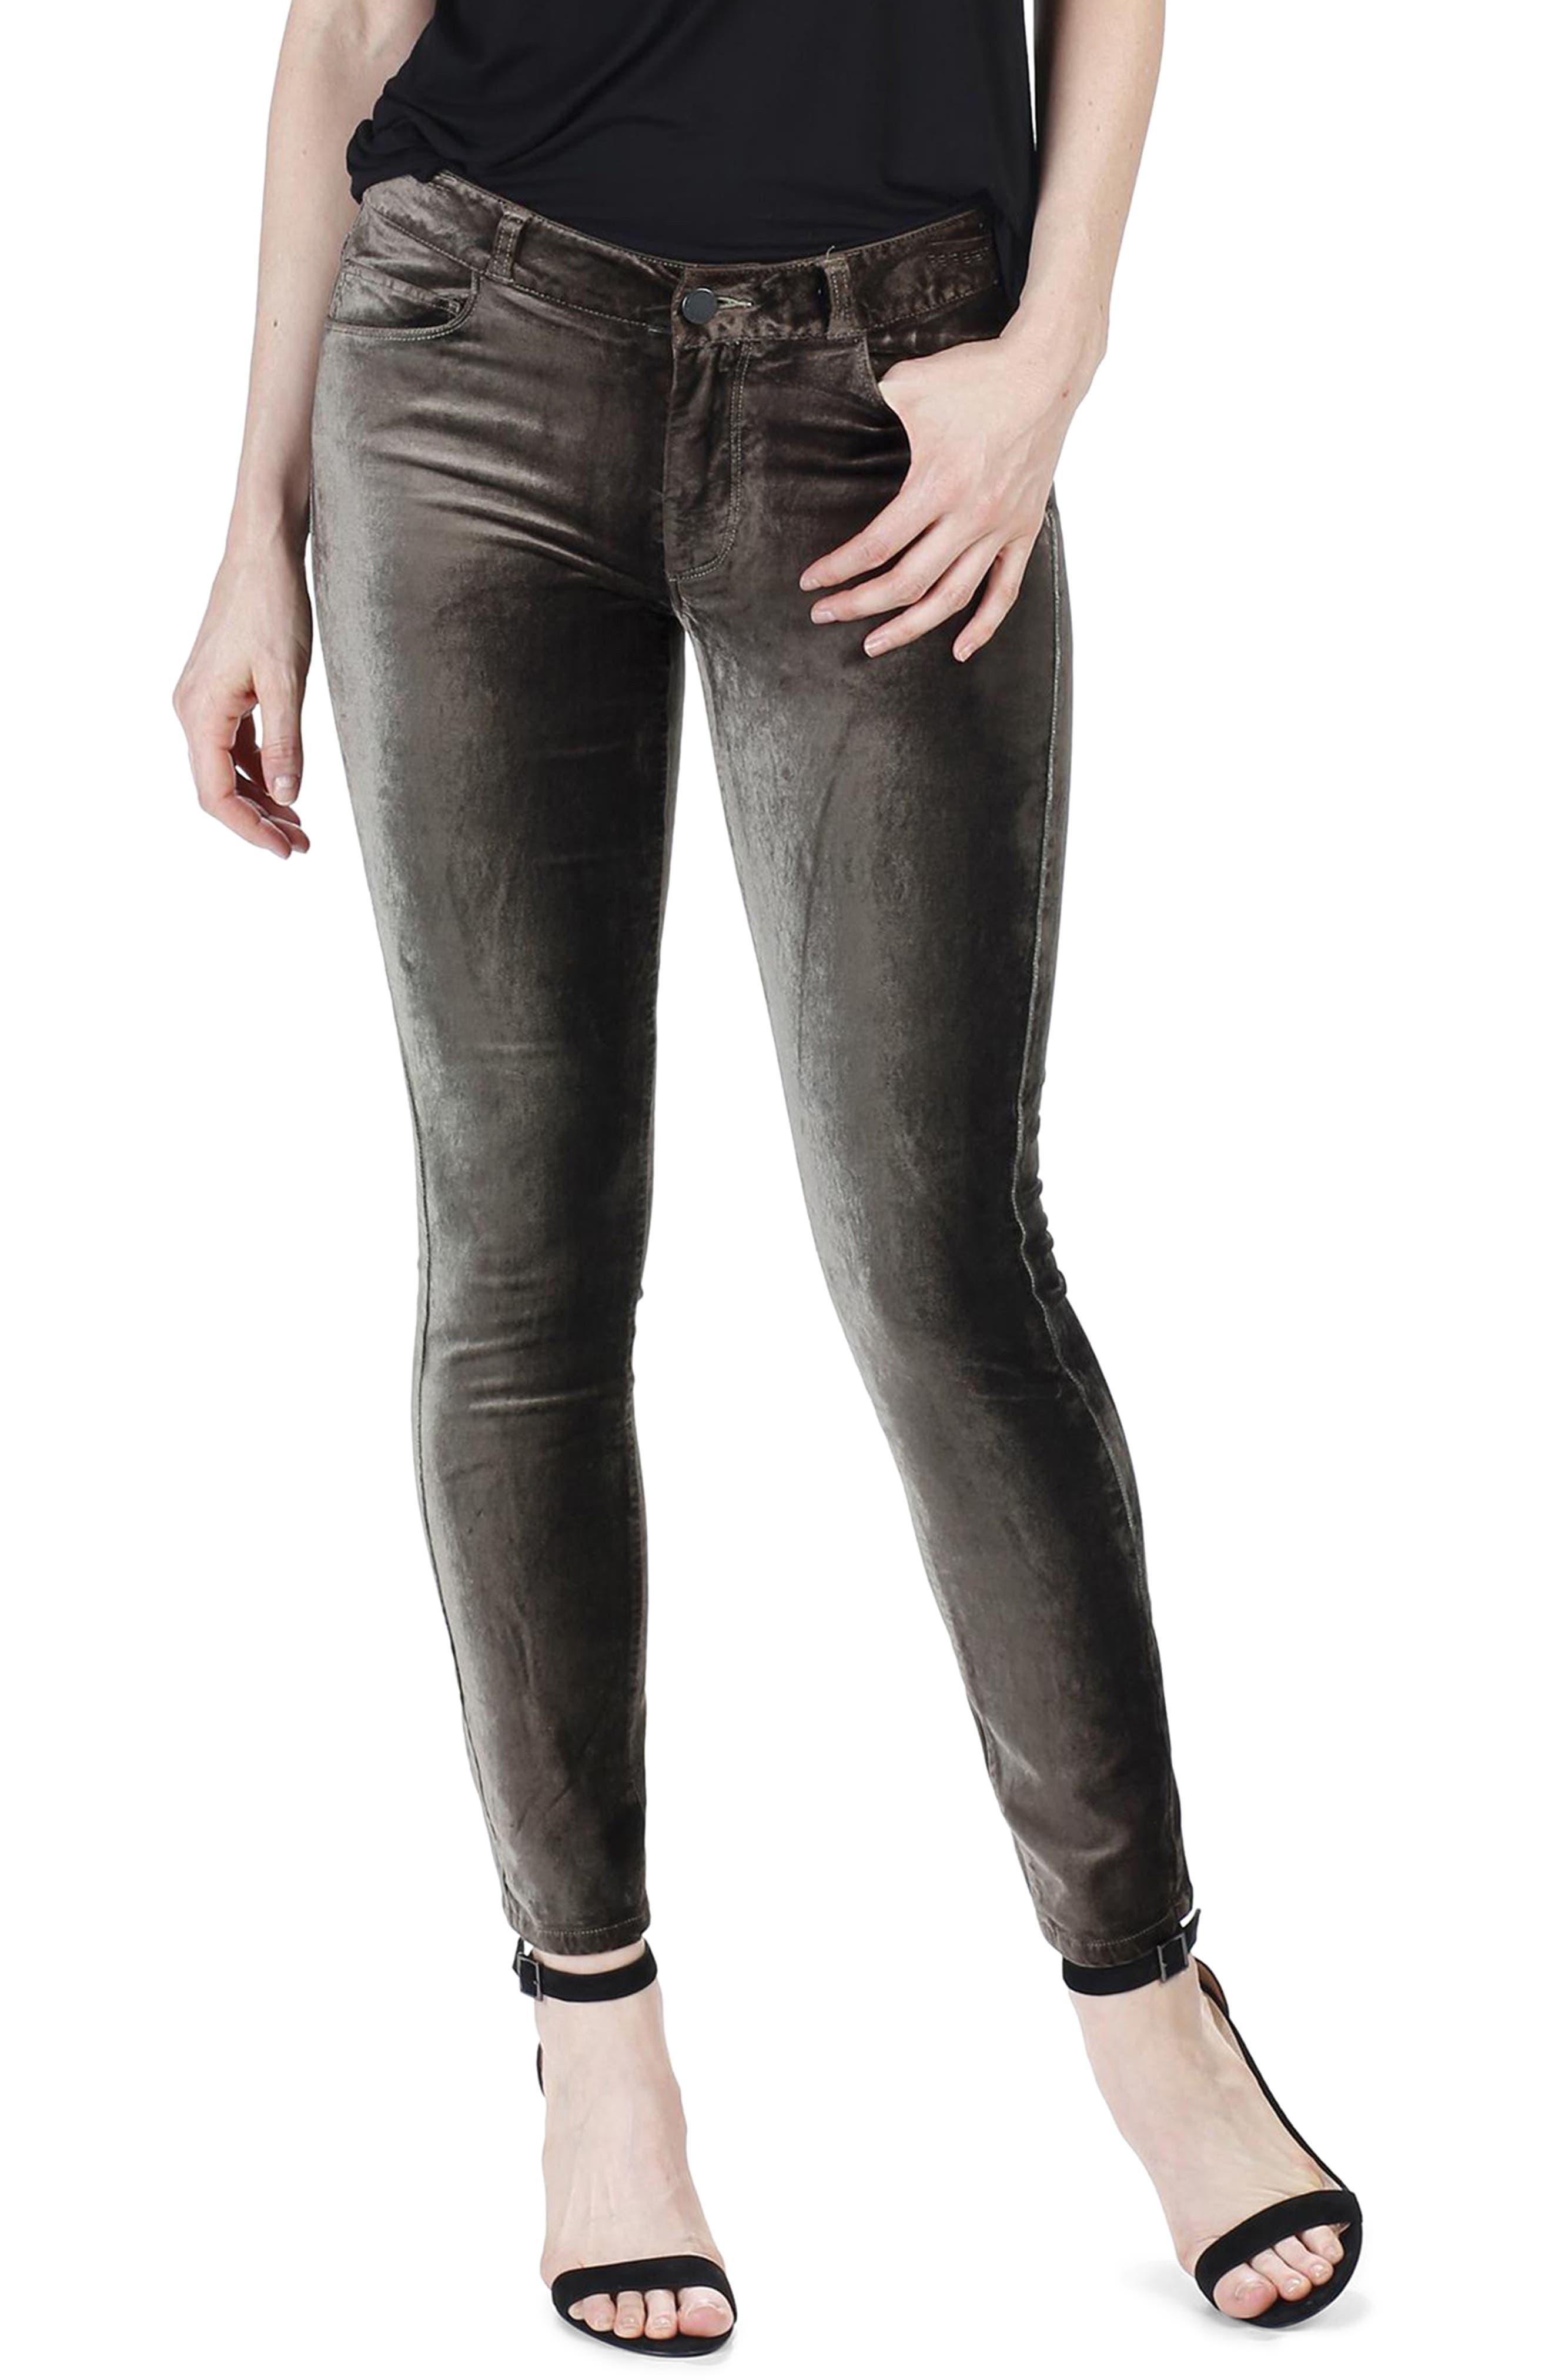 Alternate Image 1 Selected - PAIGE Verdugo Velvet Ankle Skinny Pants